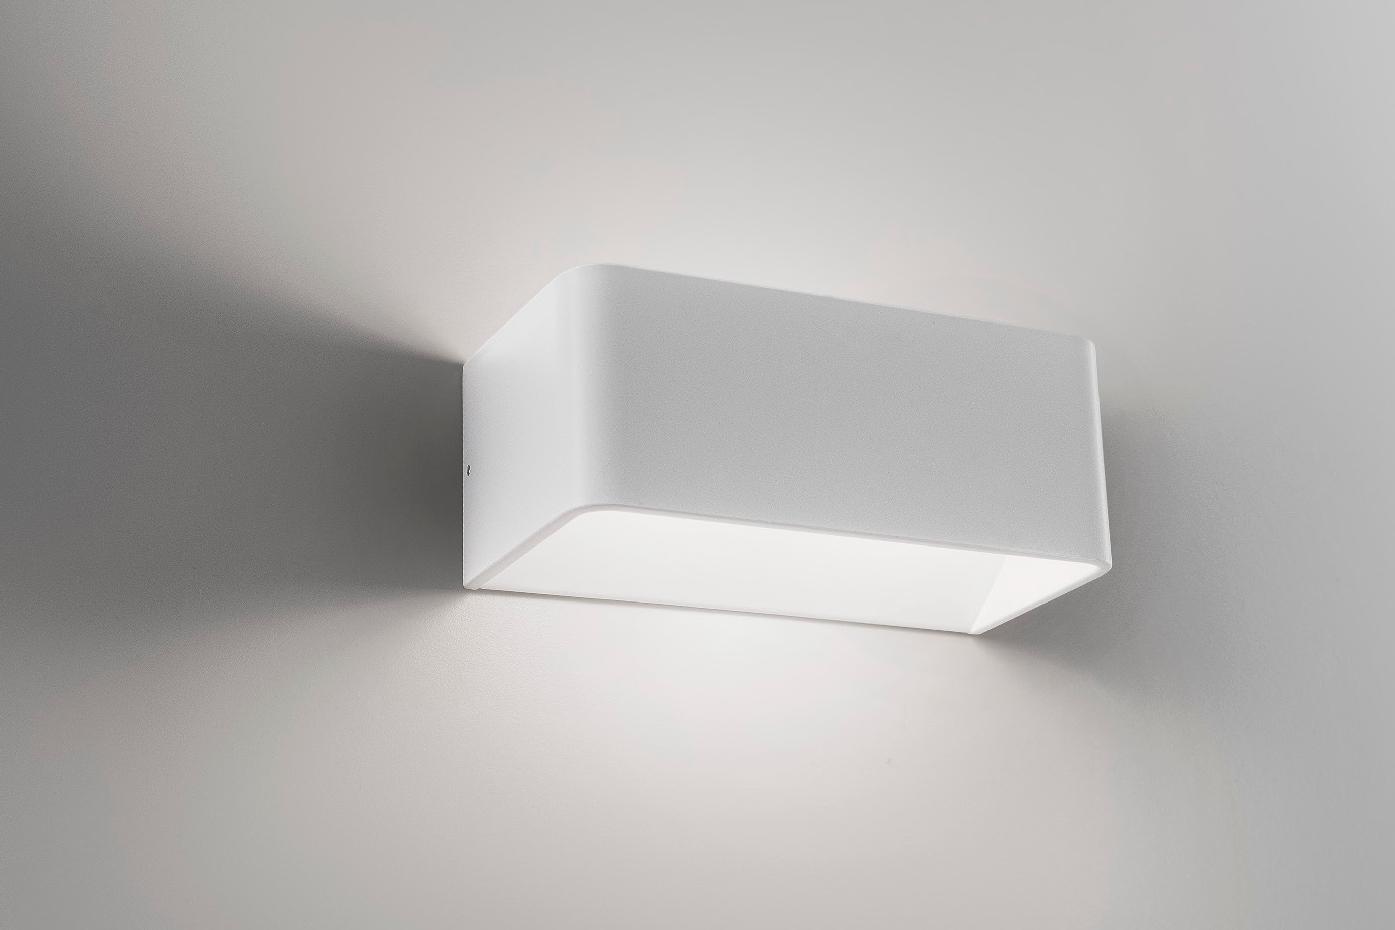 Cubetto außenlampe madeinitaly.de